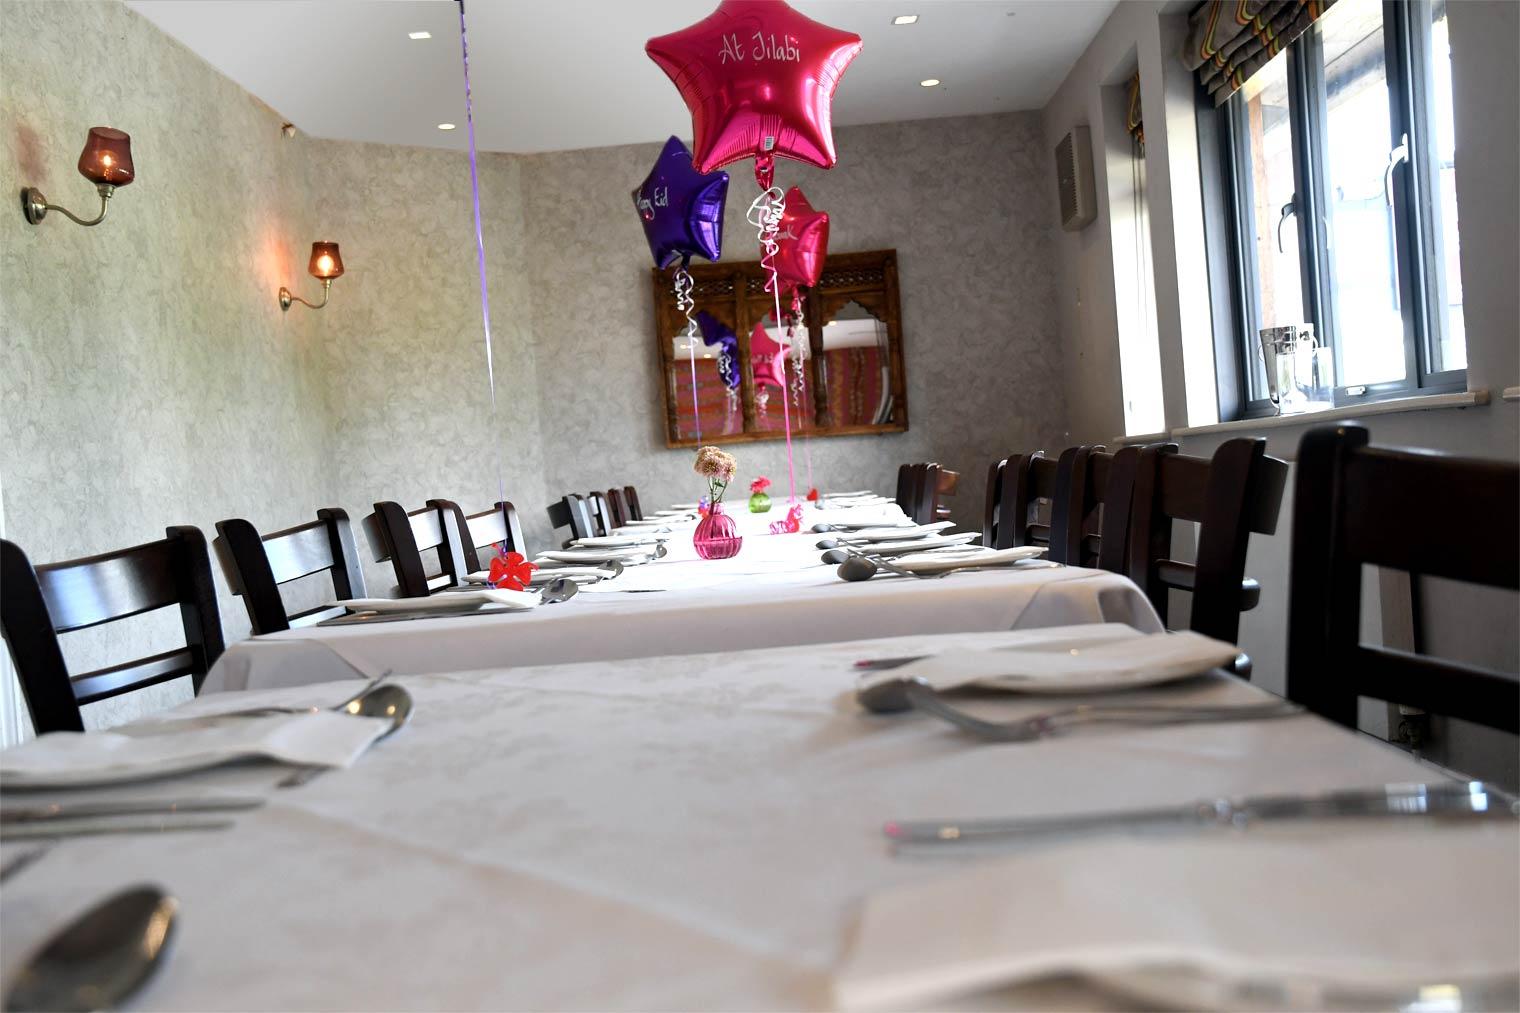 Jilabi Indian Restaurant Funtion Room in Birmingham